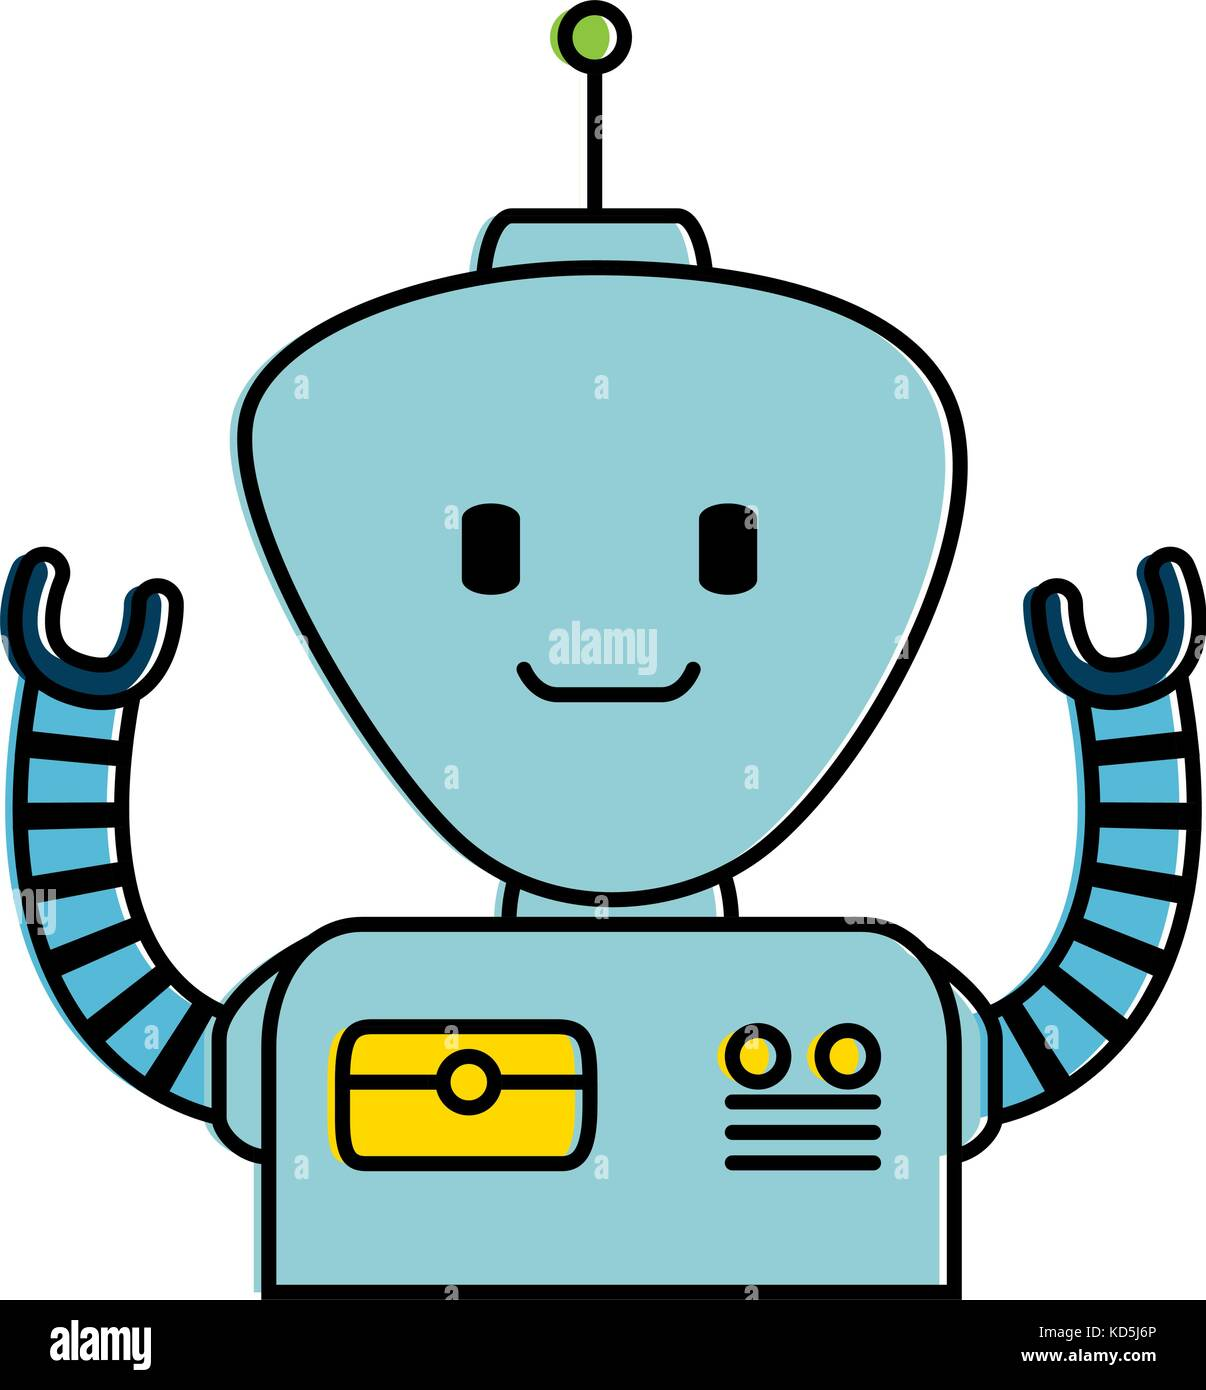 Android Symbol Stockfotos & Android Symbol Bilder - Alamy